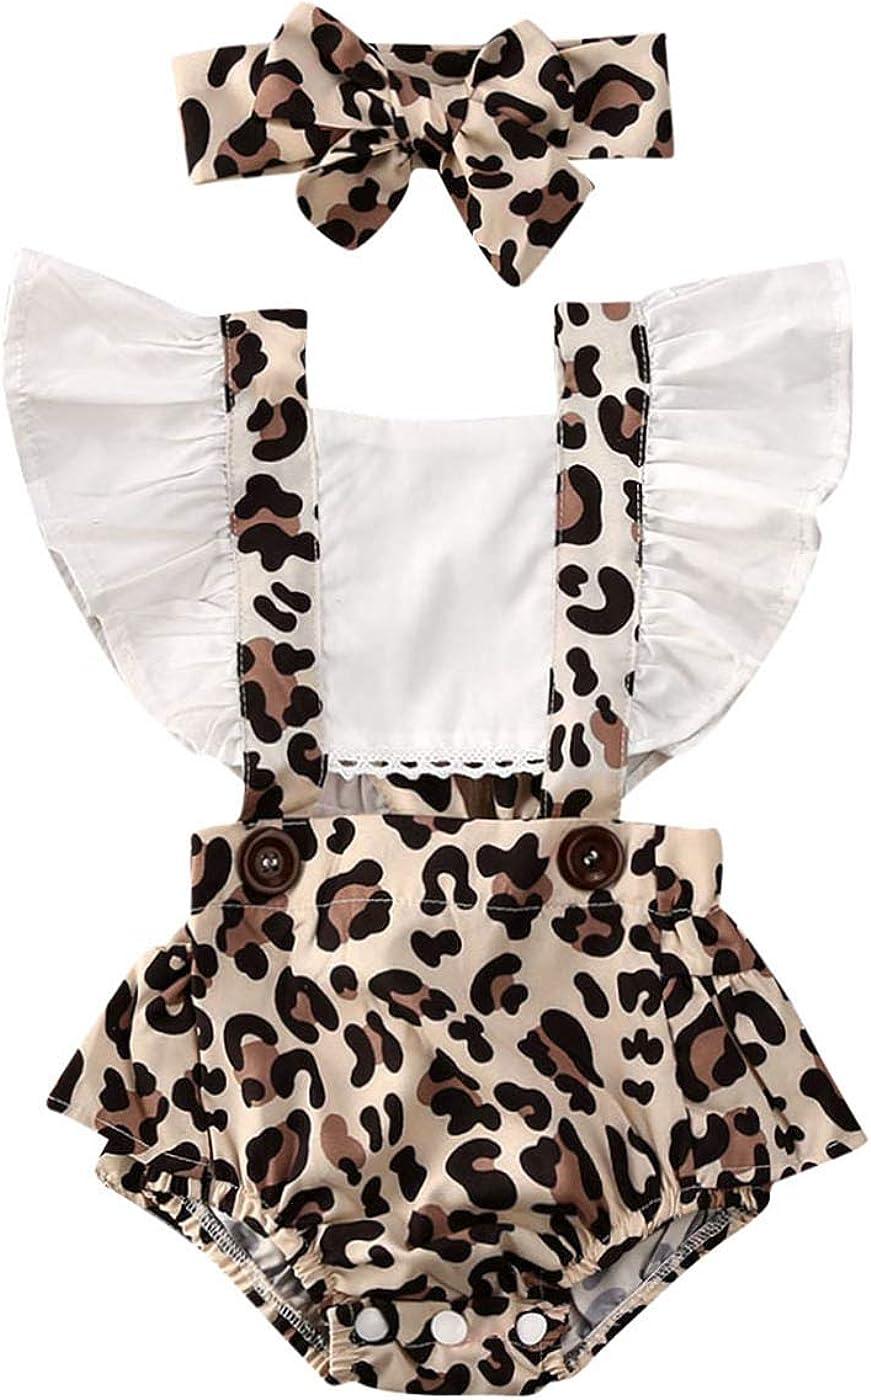 Baby Girl Atlanta Luxury goods Mall Leopard Romper Ruffle Backless Jumper Sleeve Bodysuit